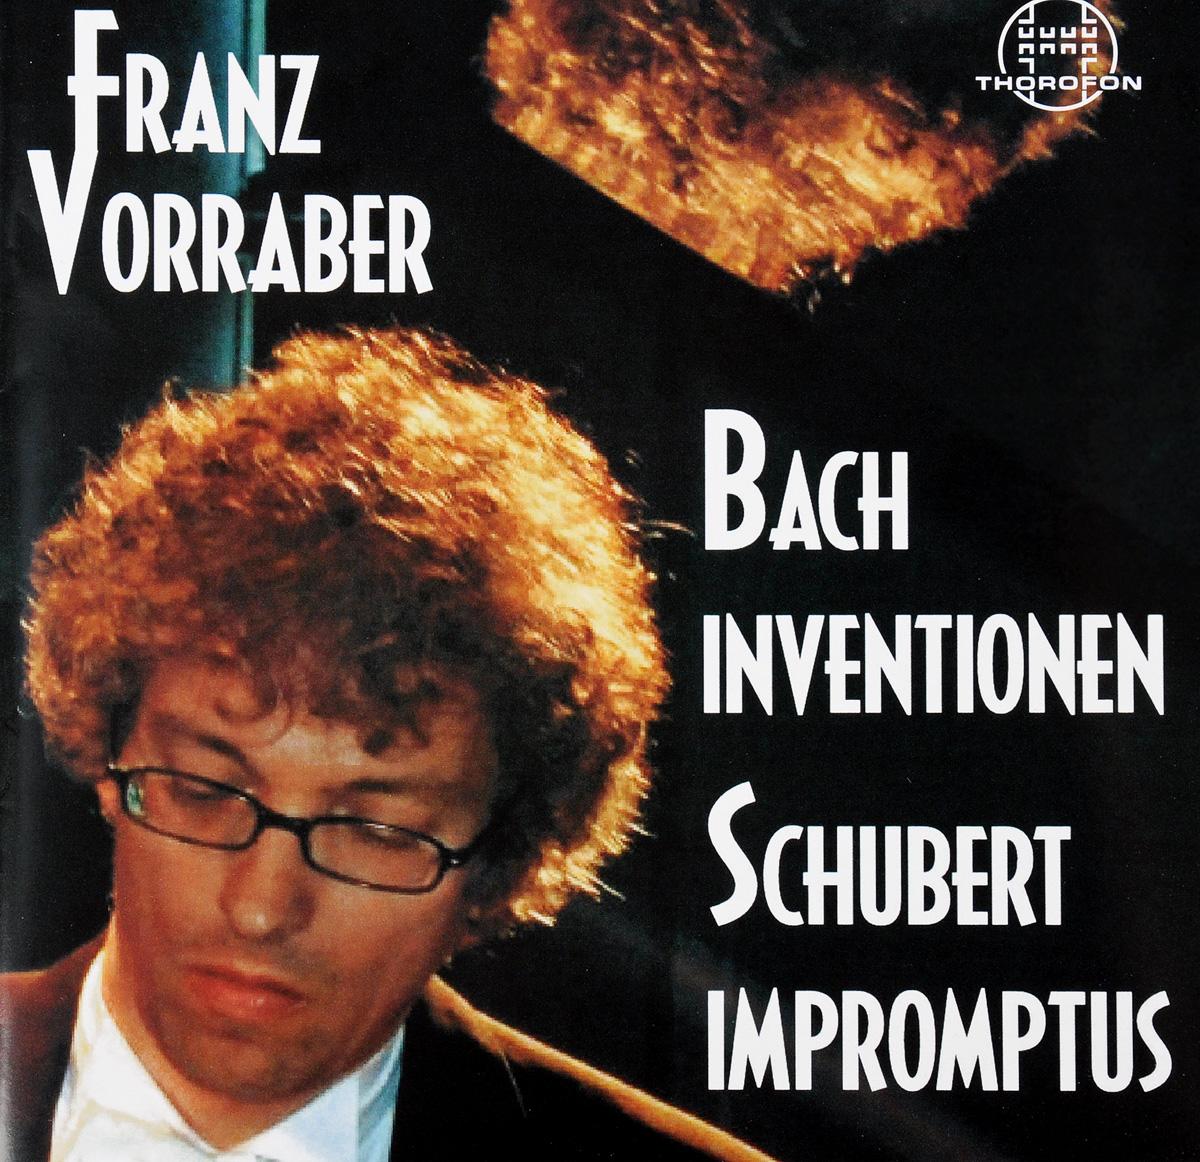 цена на Johann Sebastian Bach. Inventionen & Schubert. Impromptus